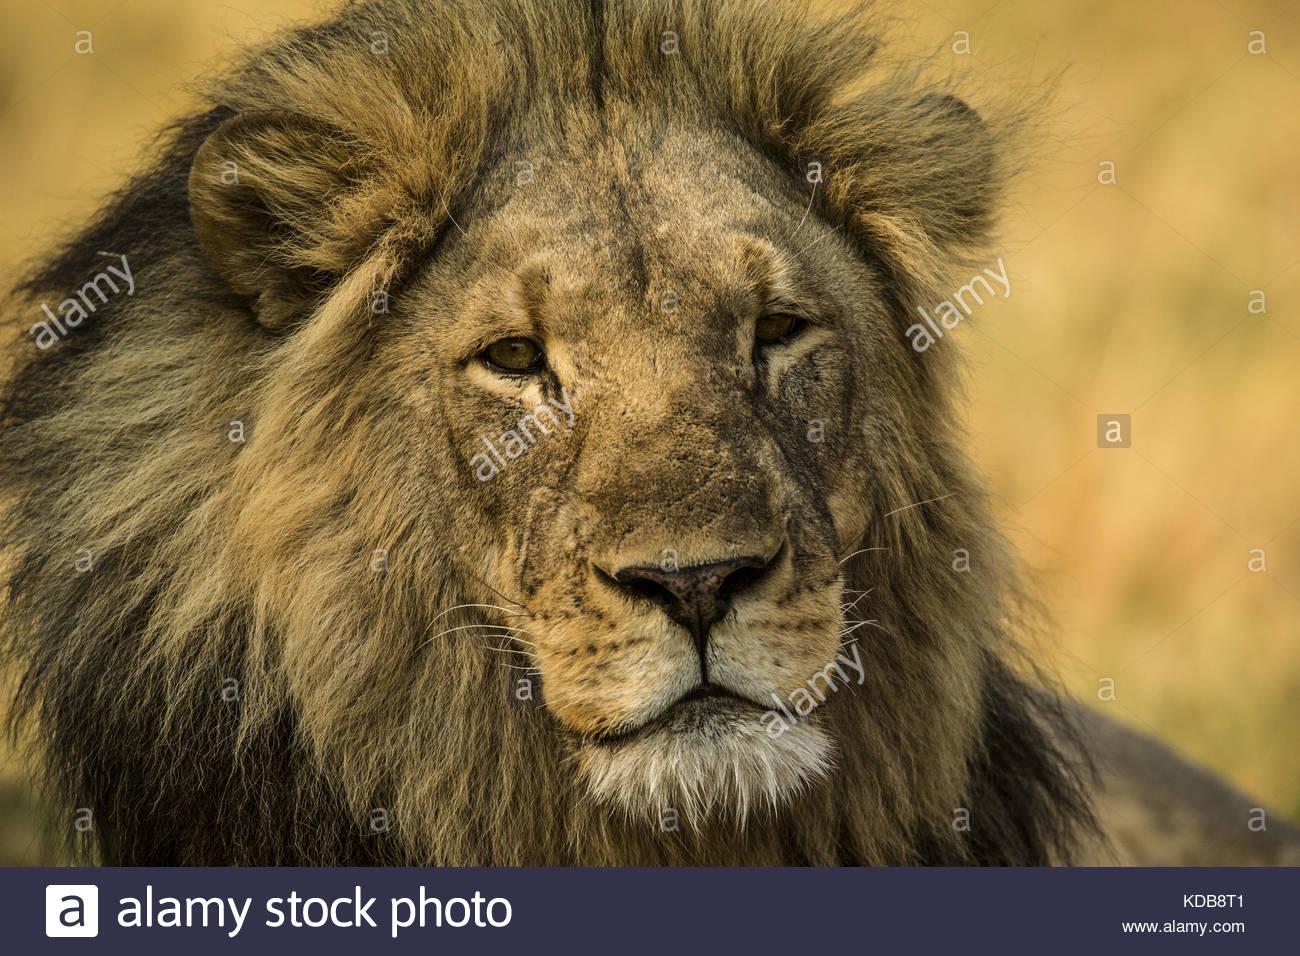 Portrait of a lion, Panthera leo. - Stock Image